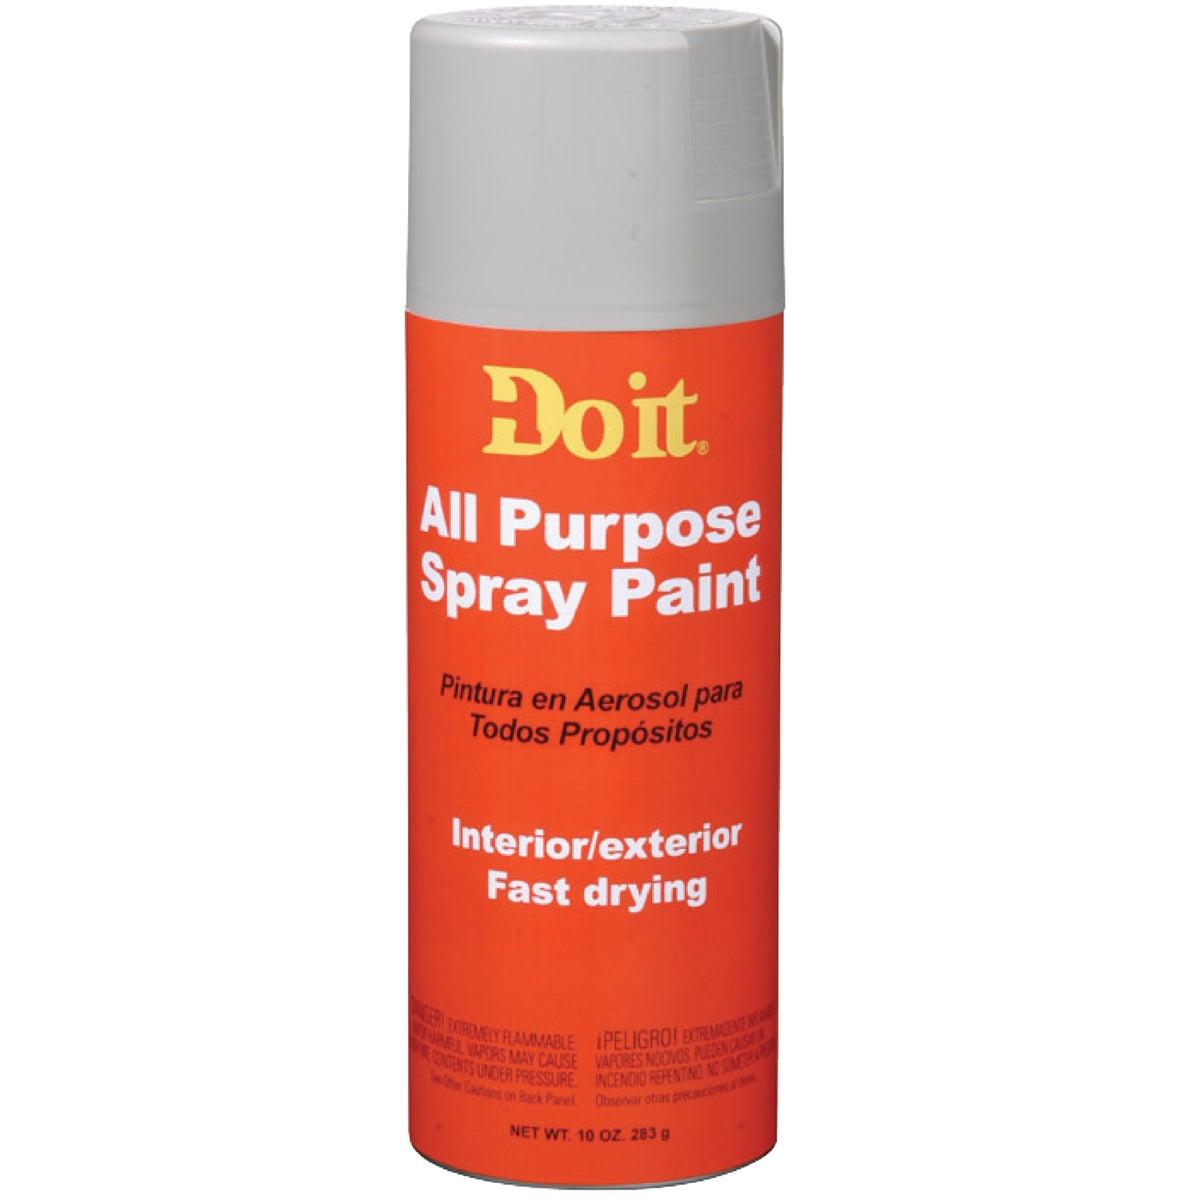 Do it All Purpose Spray Primer